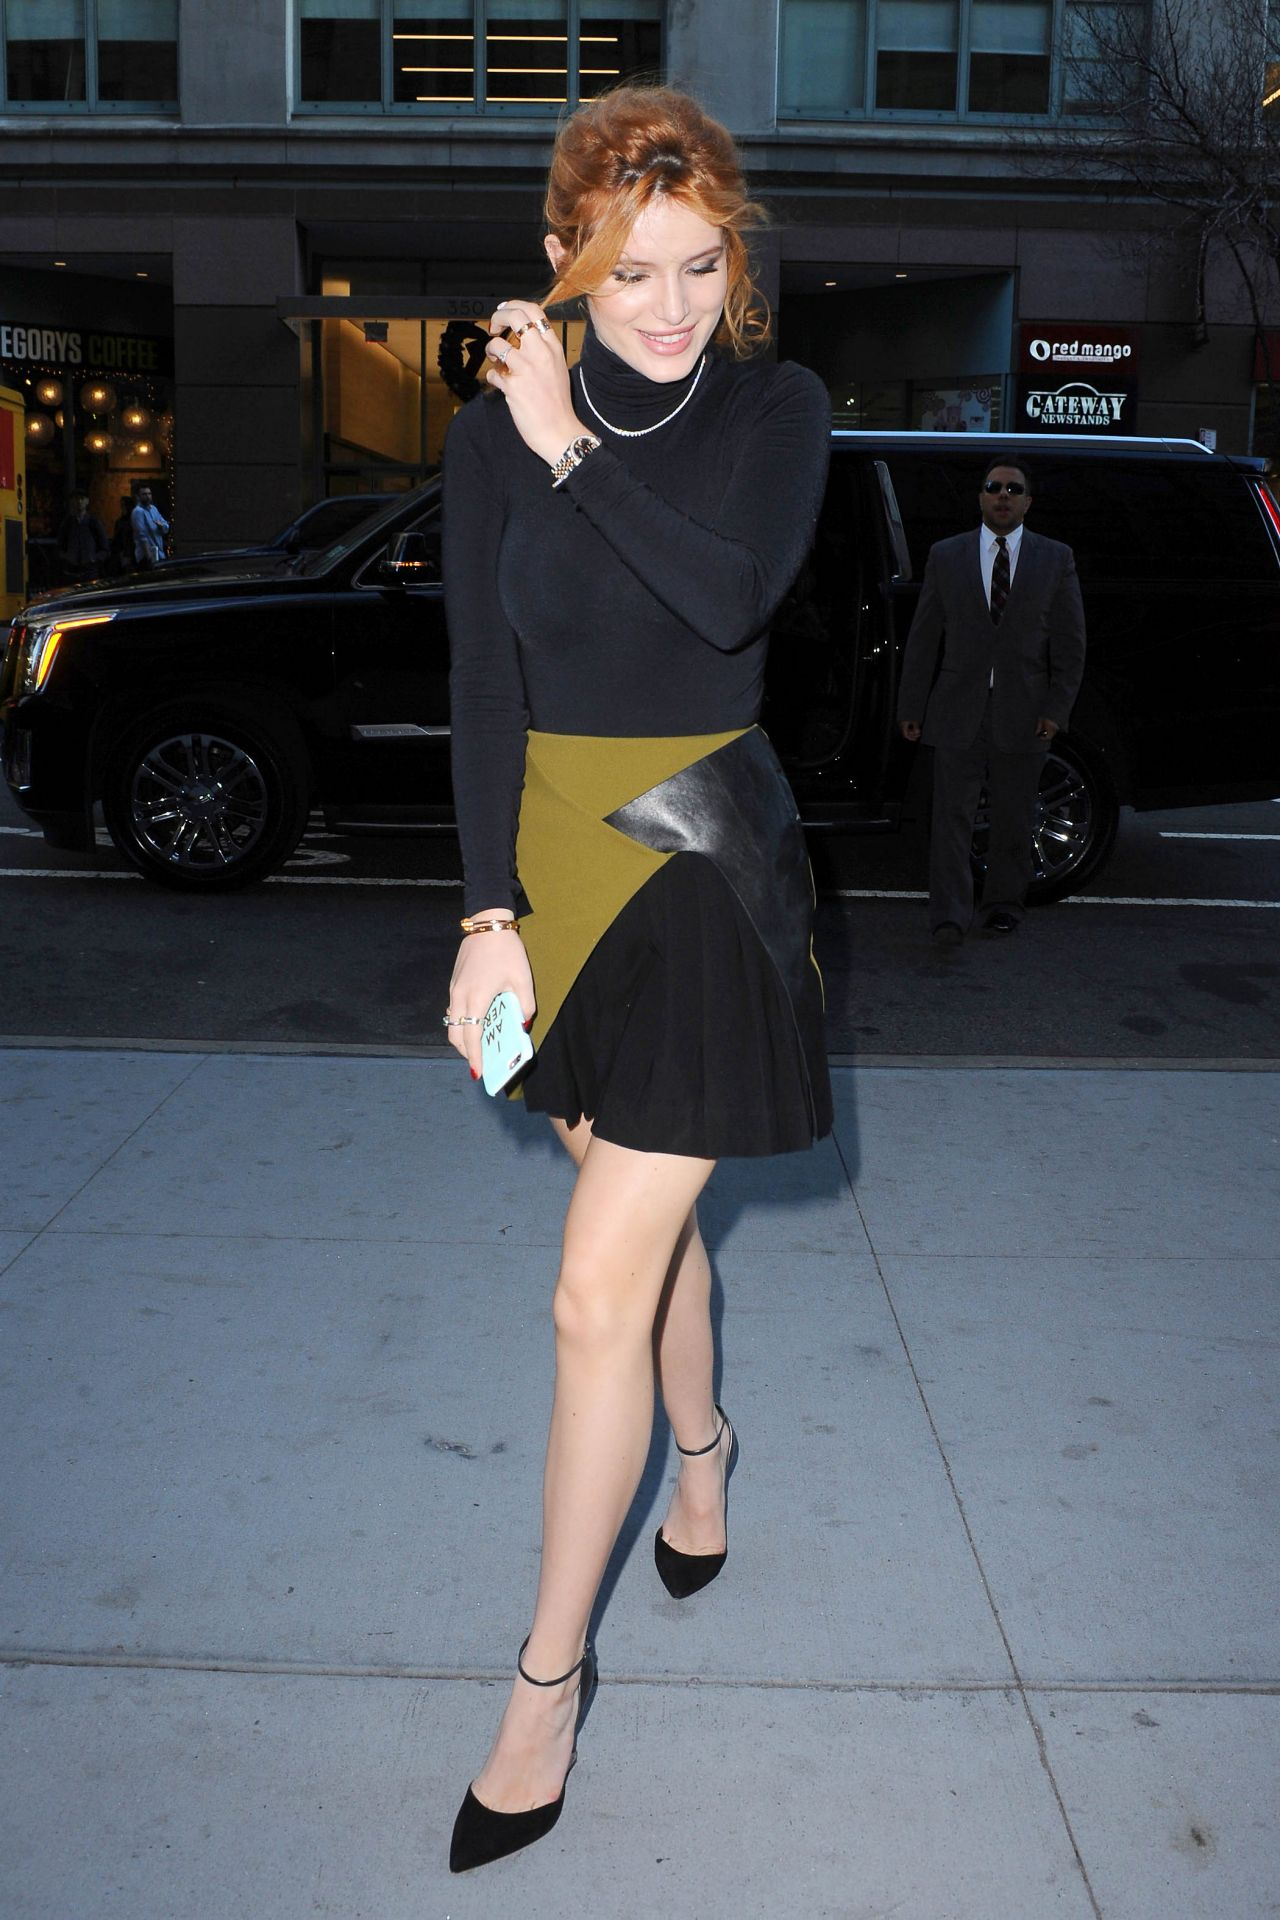 Bella Thorne In Mini Skirt Visiting The Huffington Post